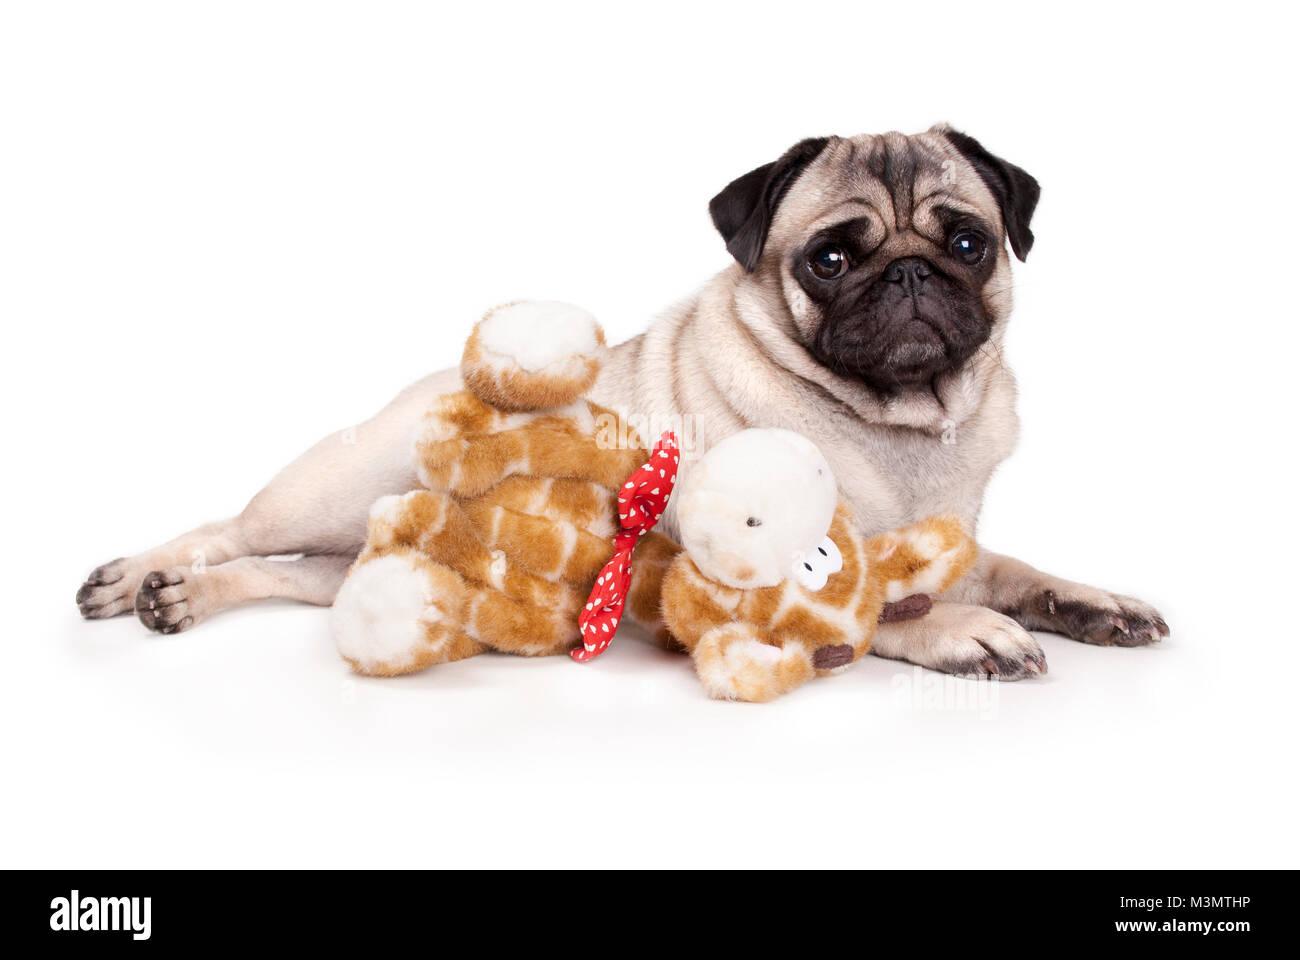 sweet pug puppy dog lying down like a model, with stuffed animal giraffe, on white background - Stock Image